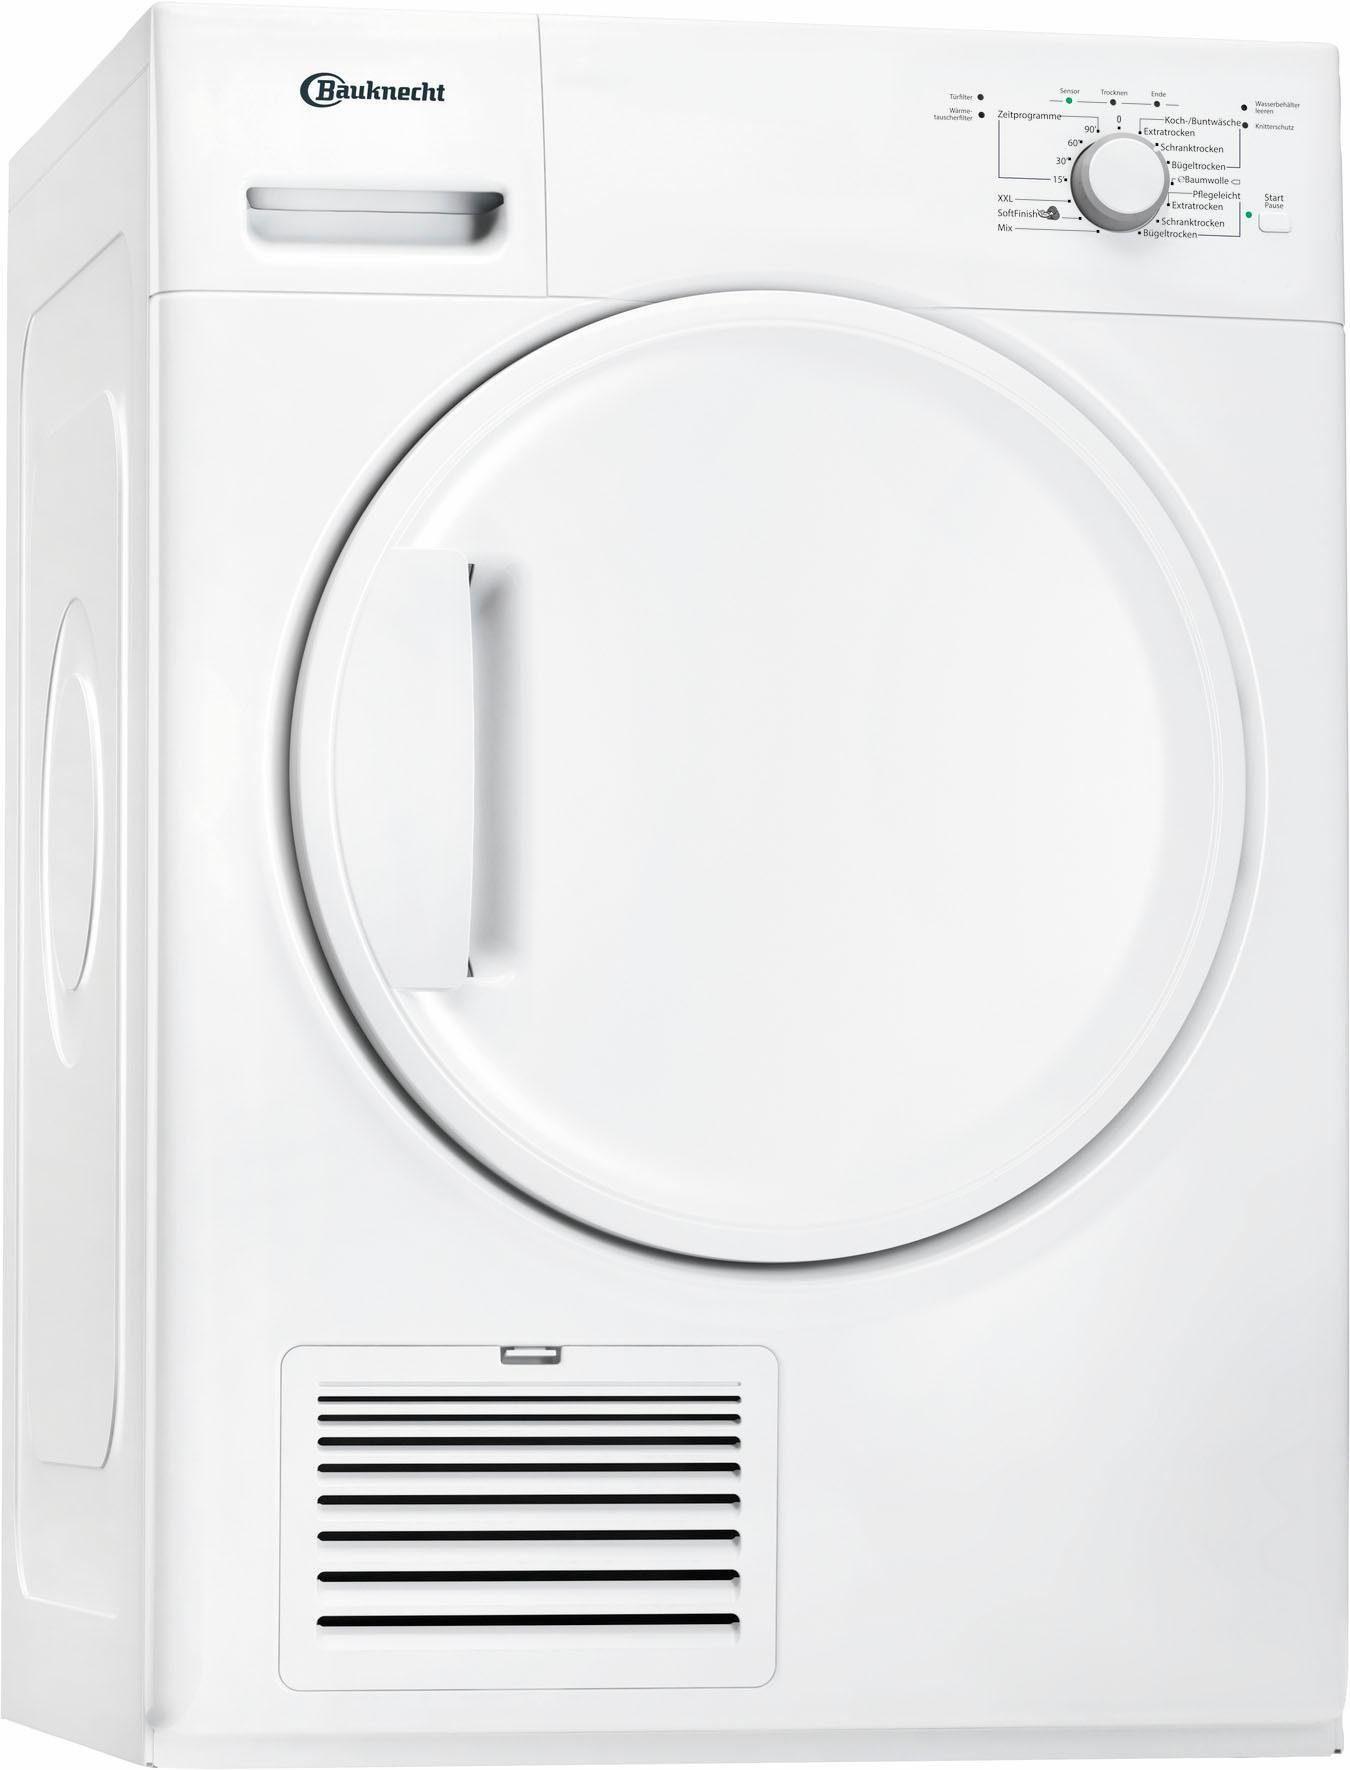 BAUKNECHT Wärmepumpentrockner TK Plus 7A1SD, 7 kg